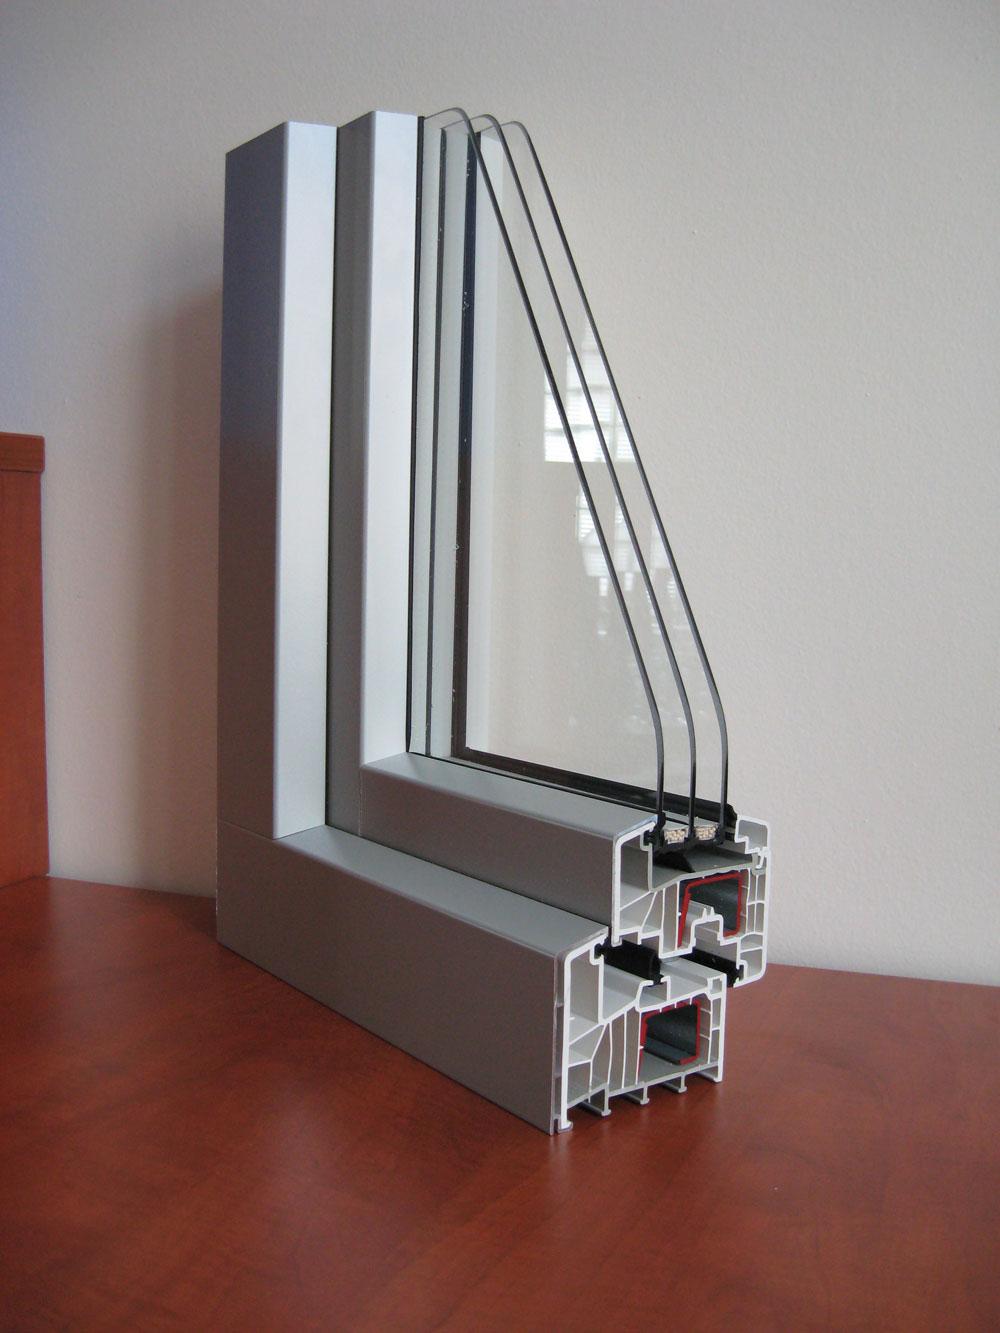 Alu upvc windows gallery uniwin windows doors for The upvc company